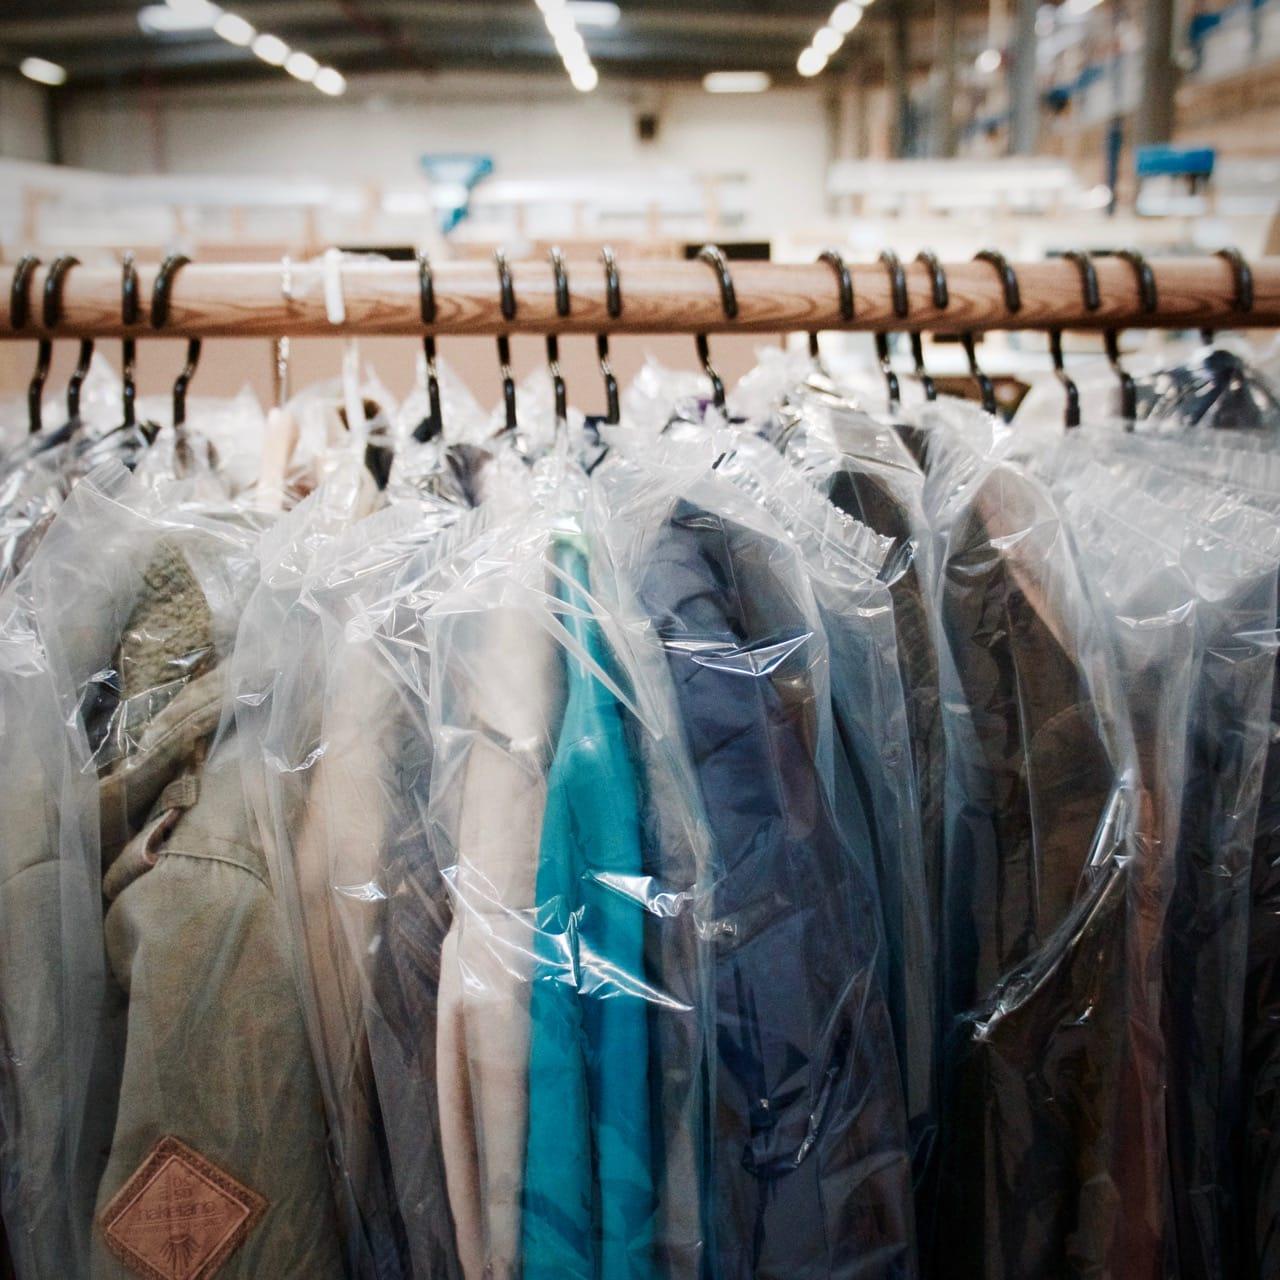 DASISTmomox fashion - Folge mir durch unser Lager 39